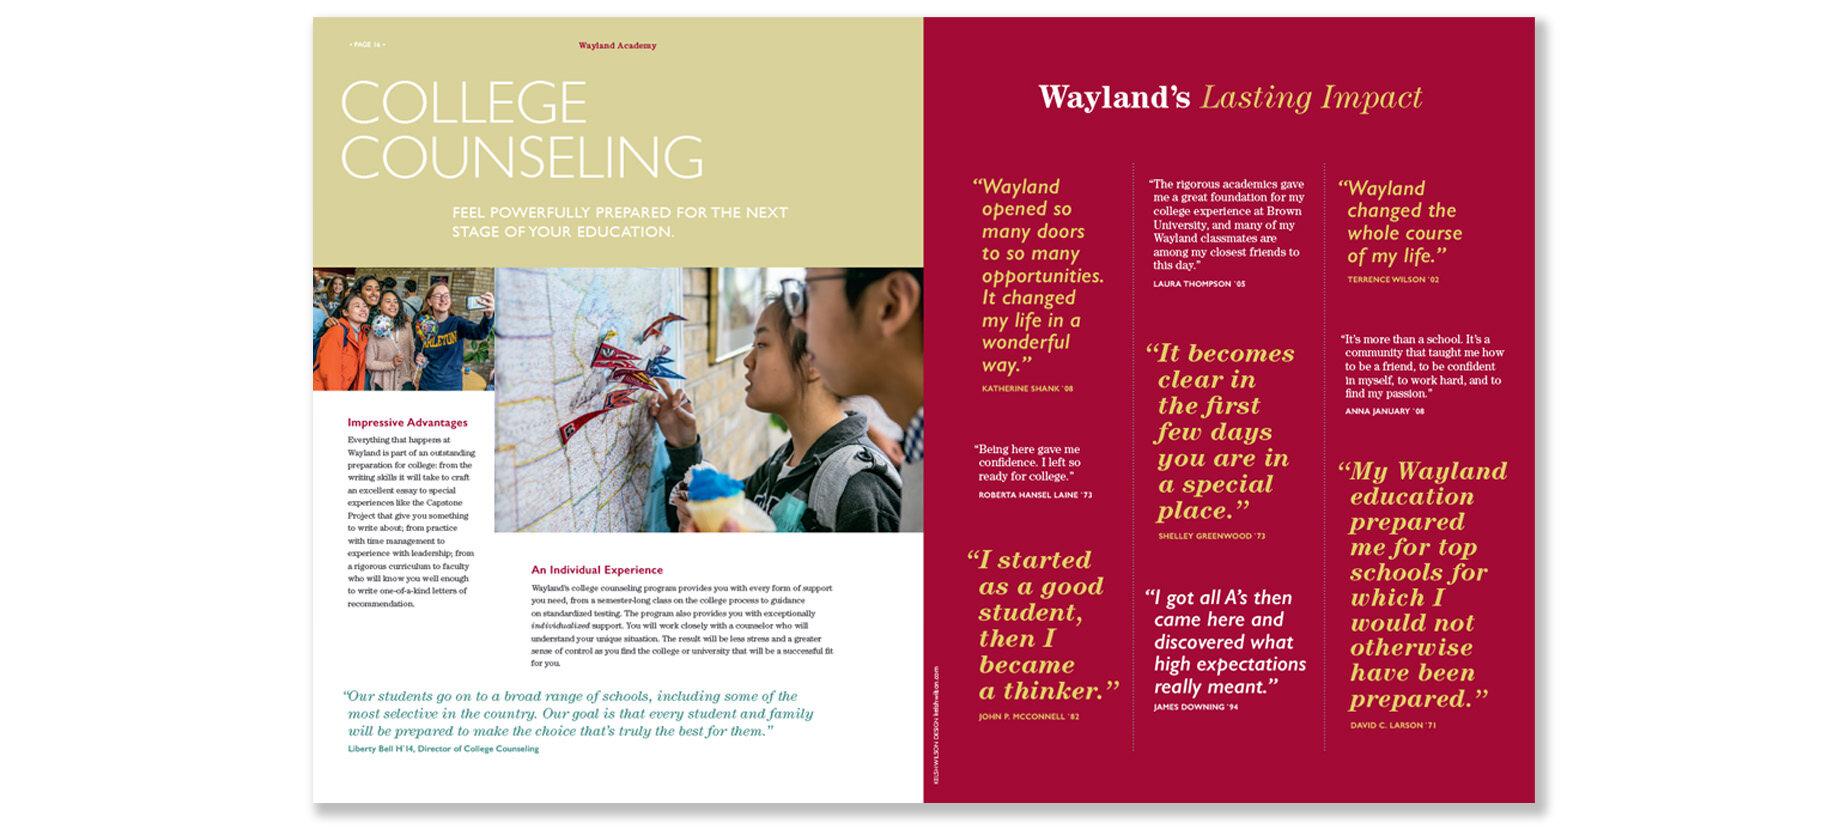 wayland-academy-viewbook-kelsh-wilson-9.jpg